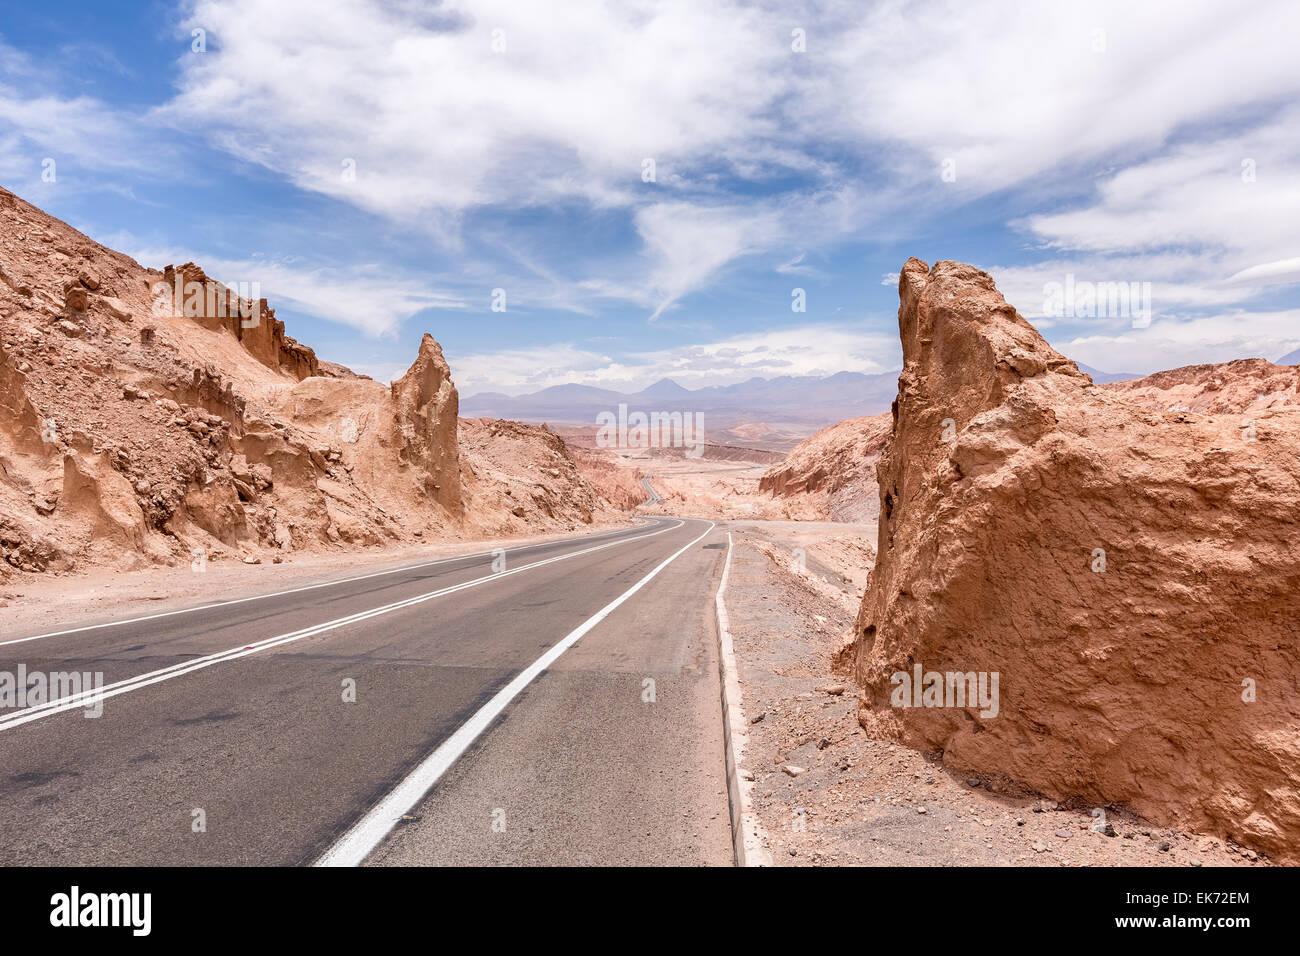 Desert road near San Pedro de Atacama, Chile, South America - Stock Image